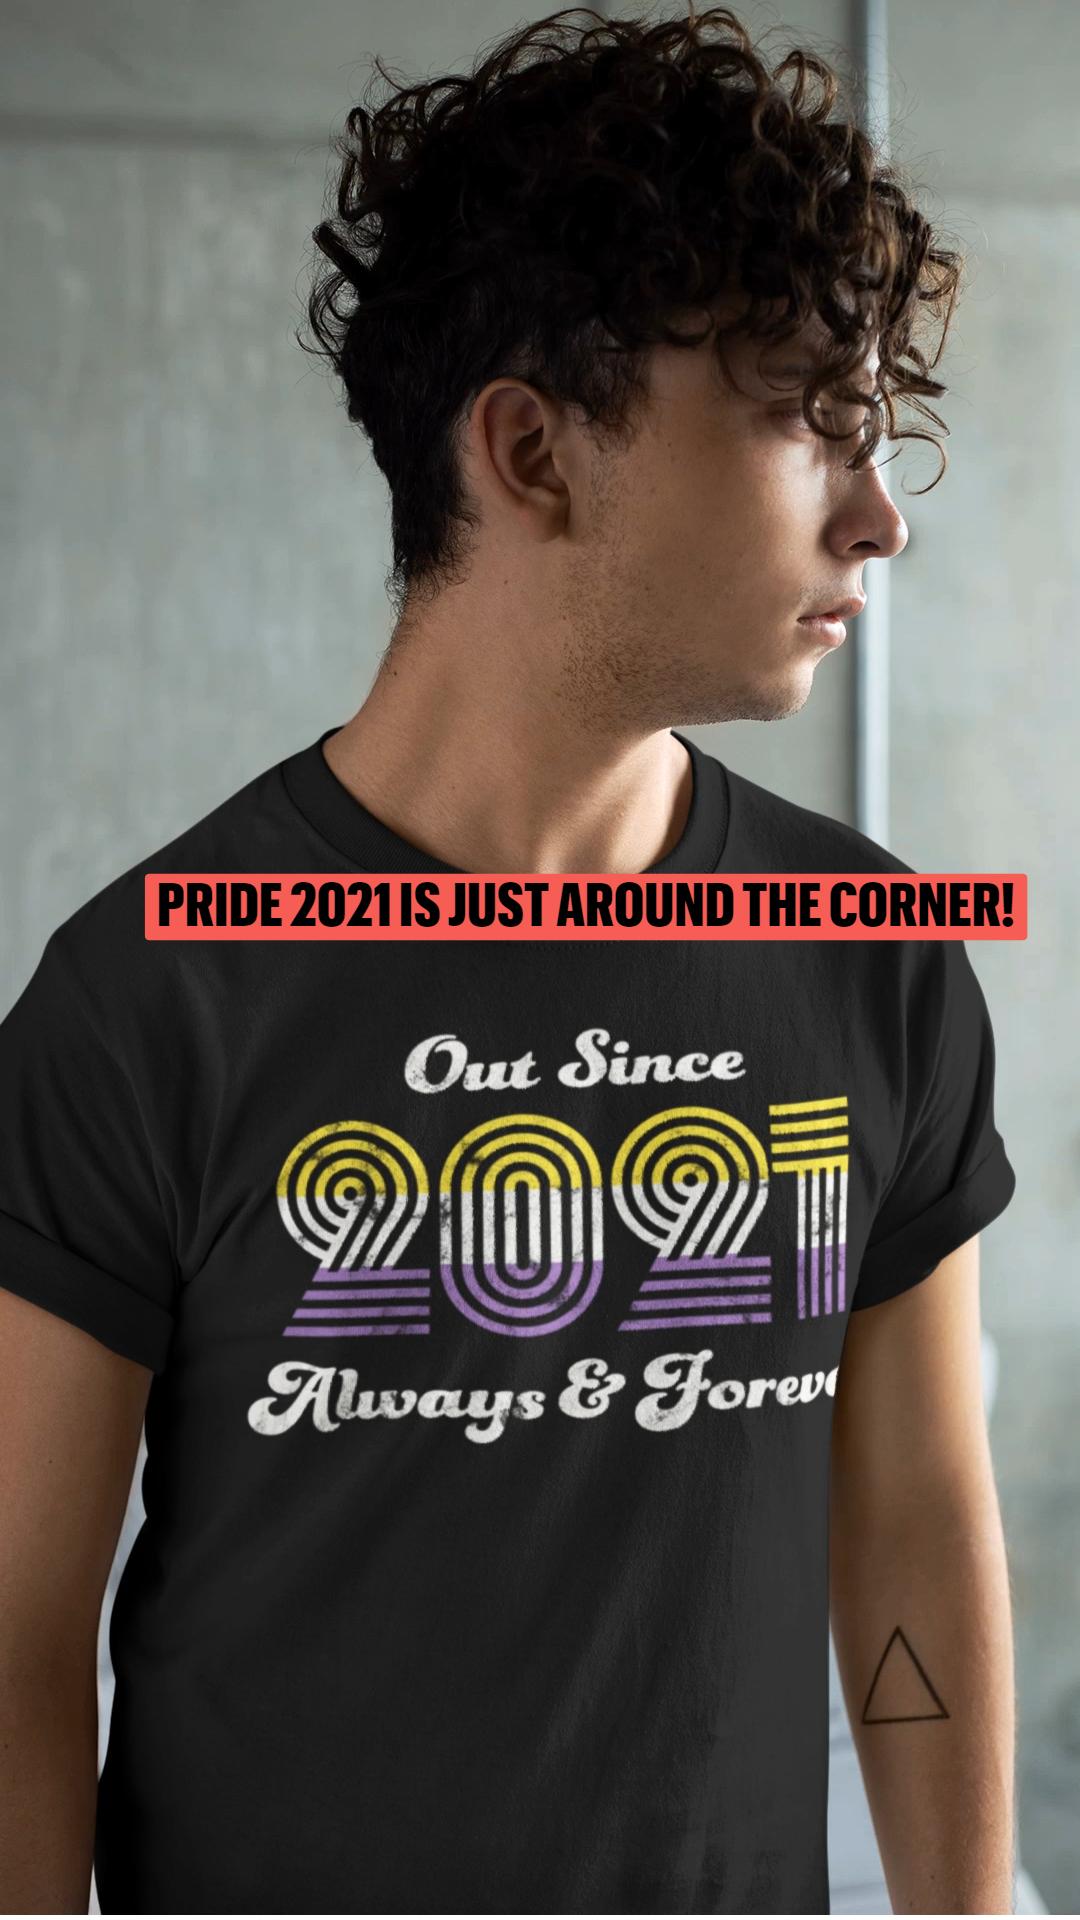 Pride 2021 is just around the corner!